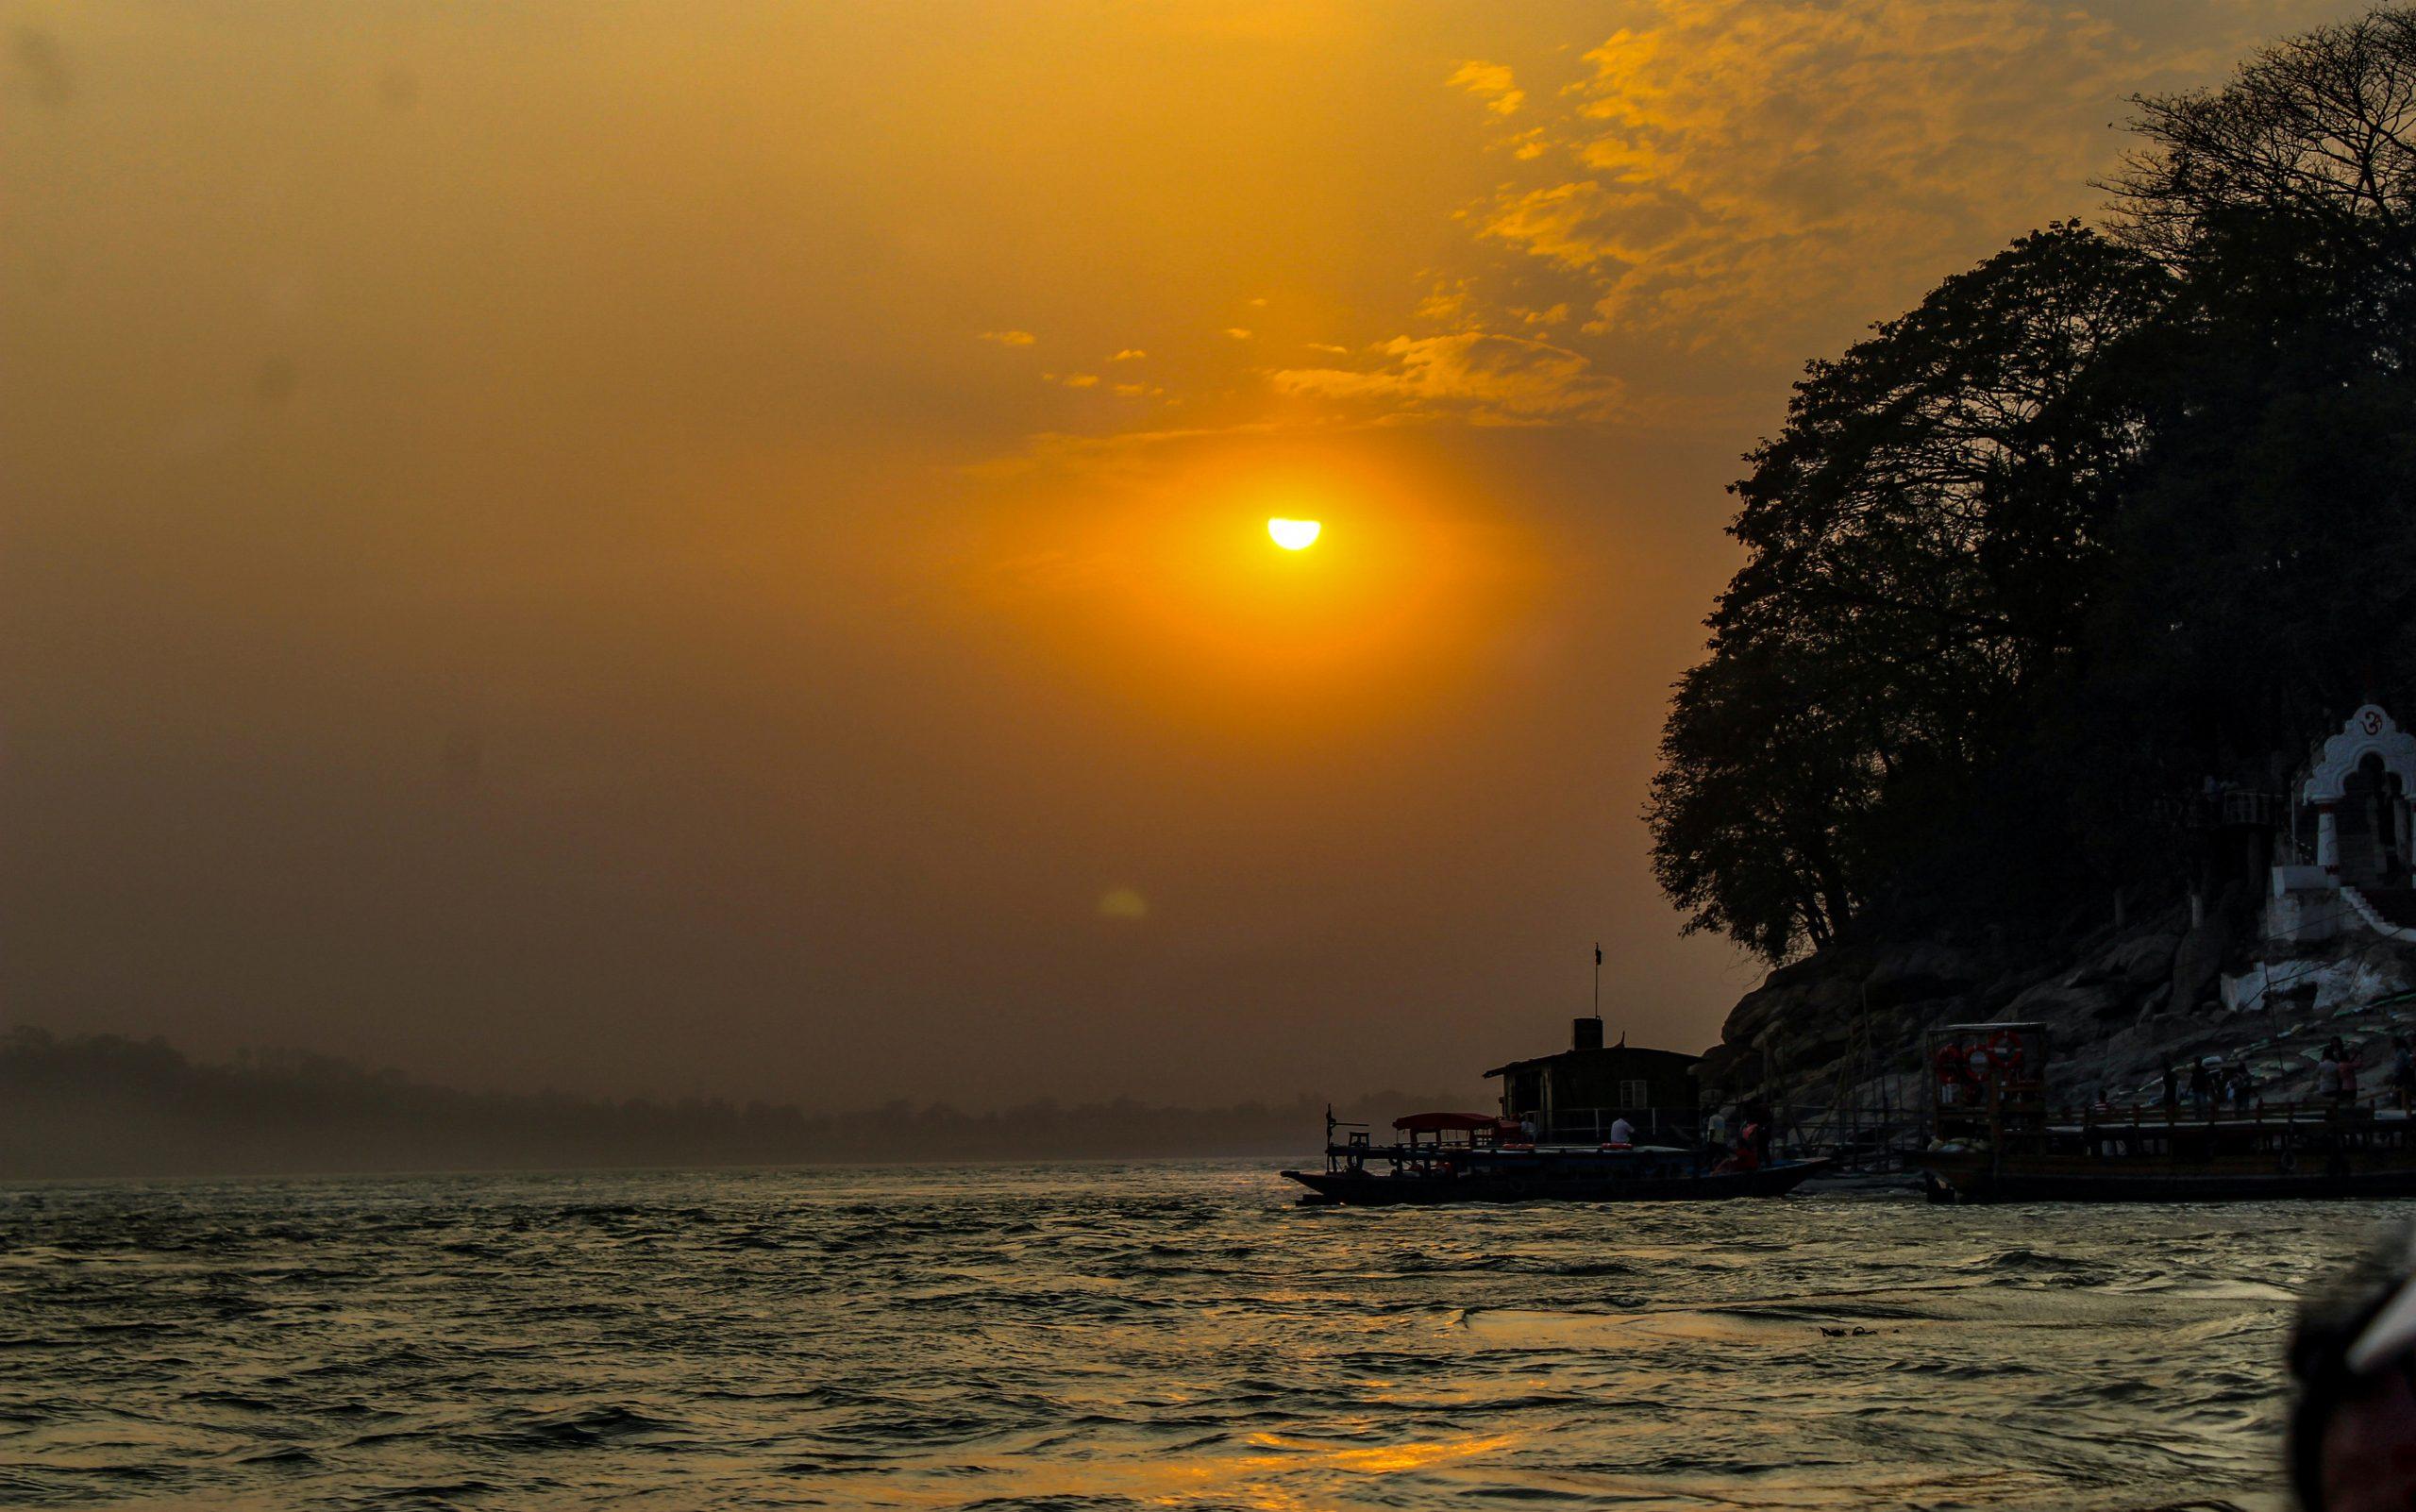 Sunset through a river